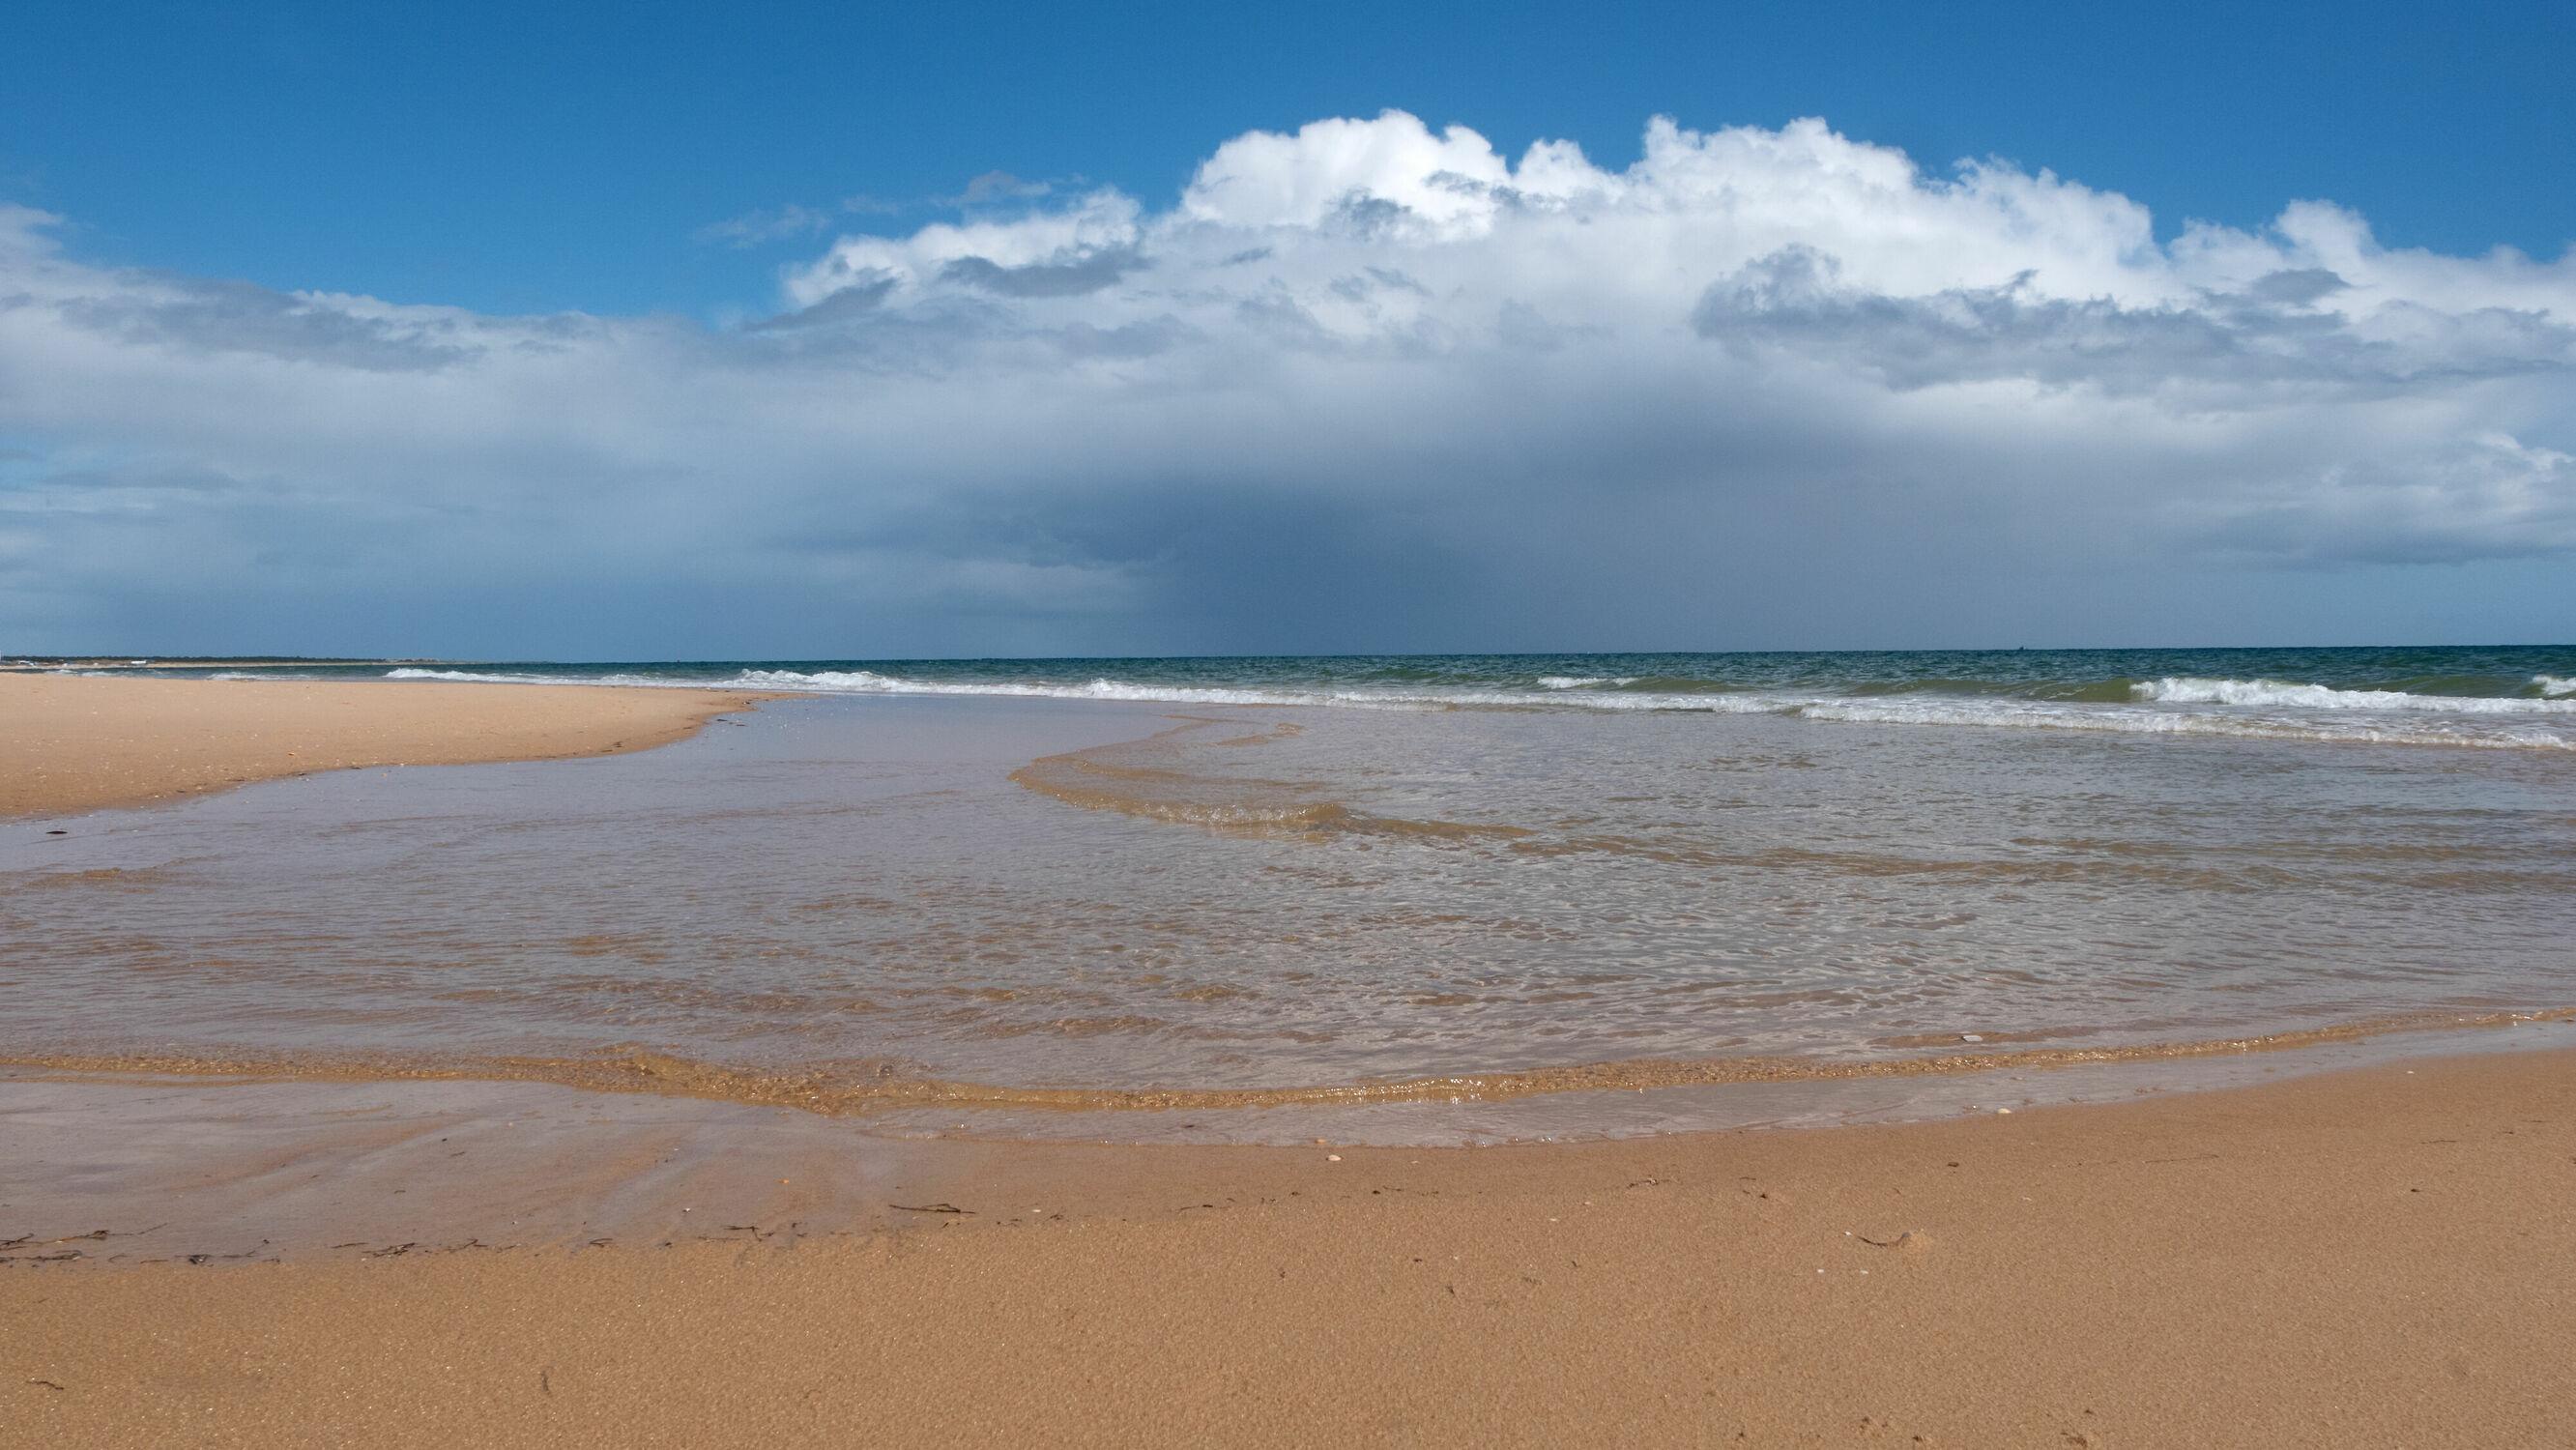 Bild mit Natur, Frühling, Brandung, Sandstrand, Wolkenhimmel, Atlantik, Portugal, Wellen Ozean, Algarve